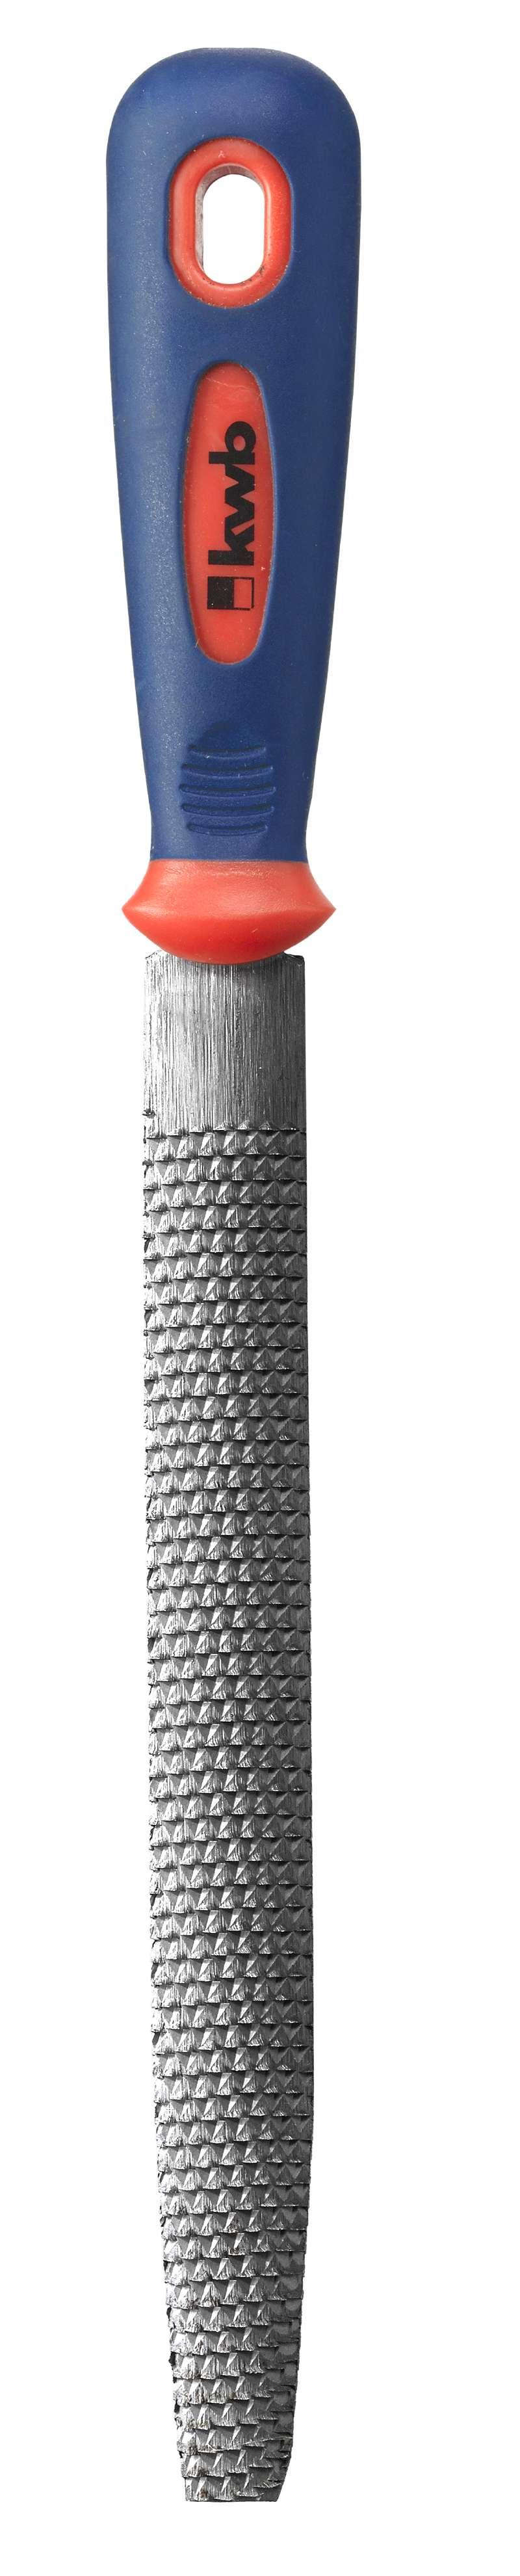 Рашпиль Kwb 4804-20 foxriver носки туристические 2097 trailhead серый